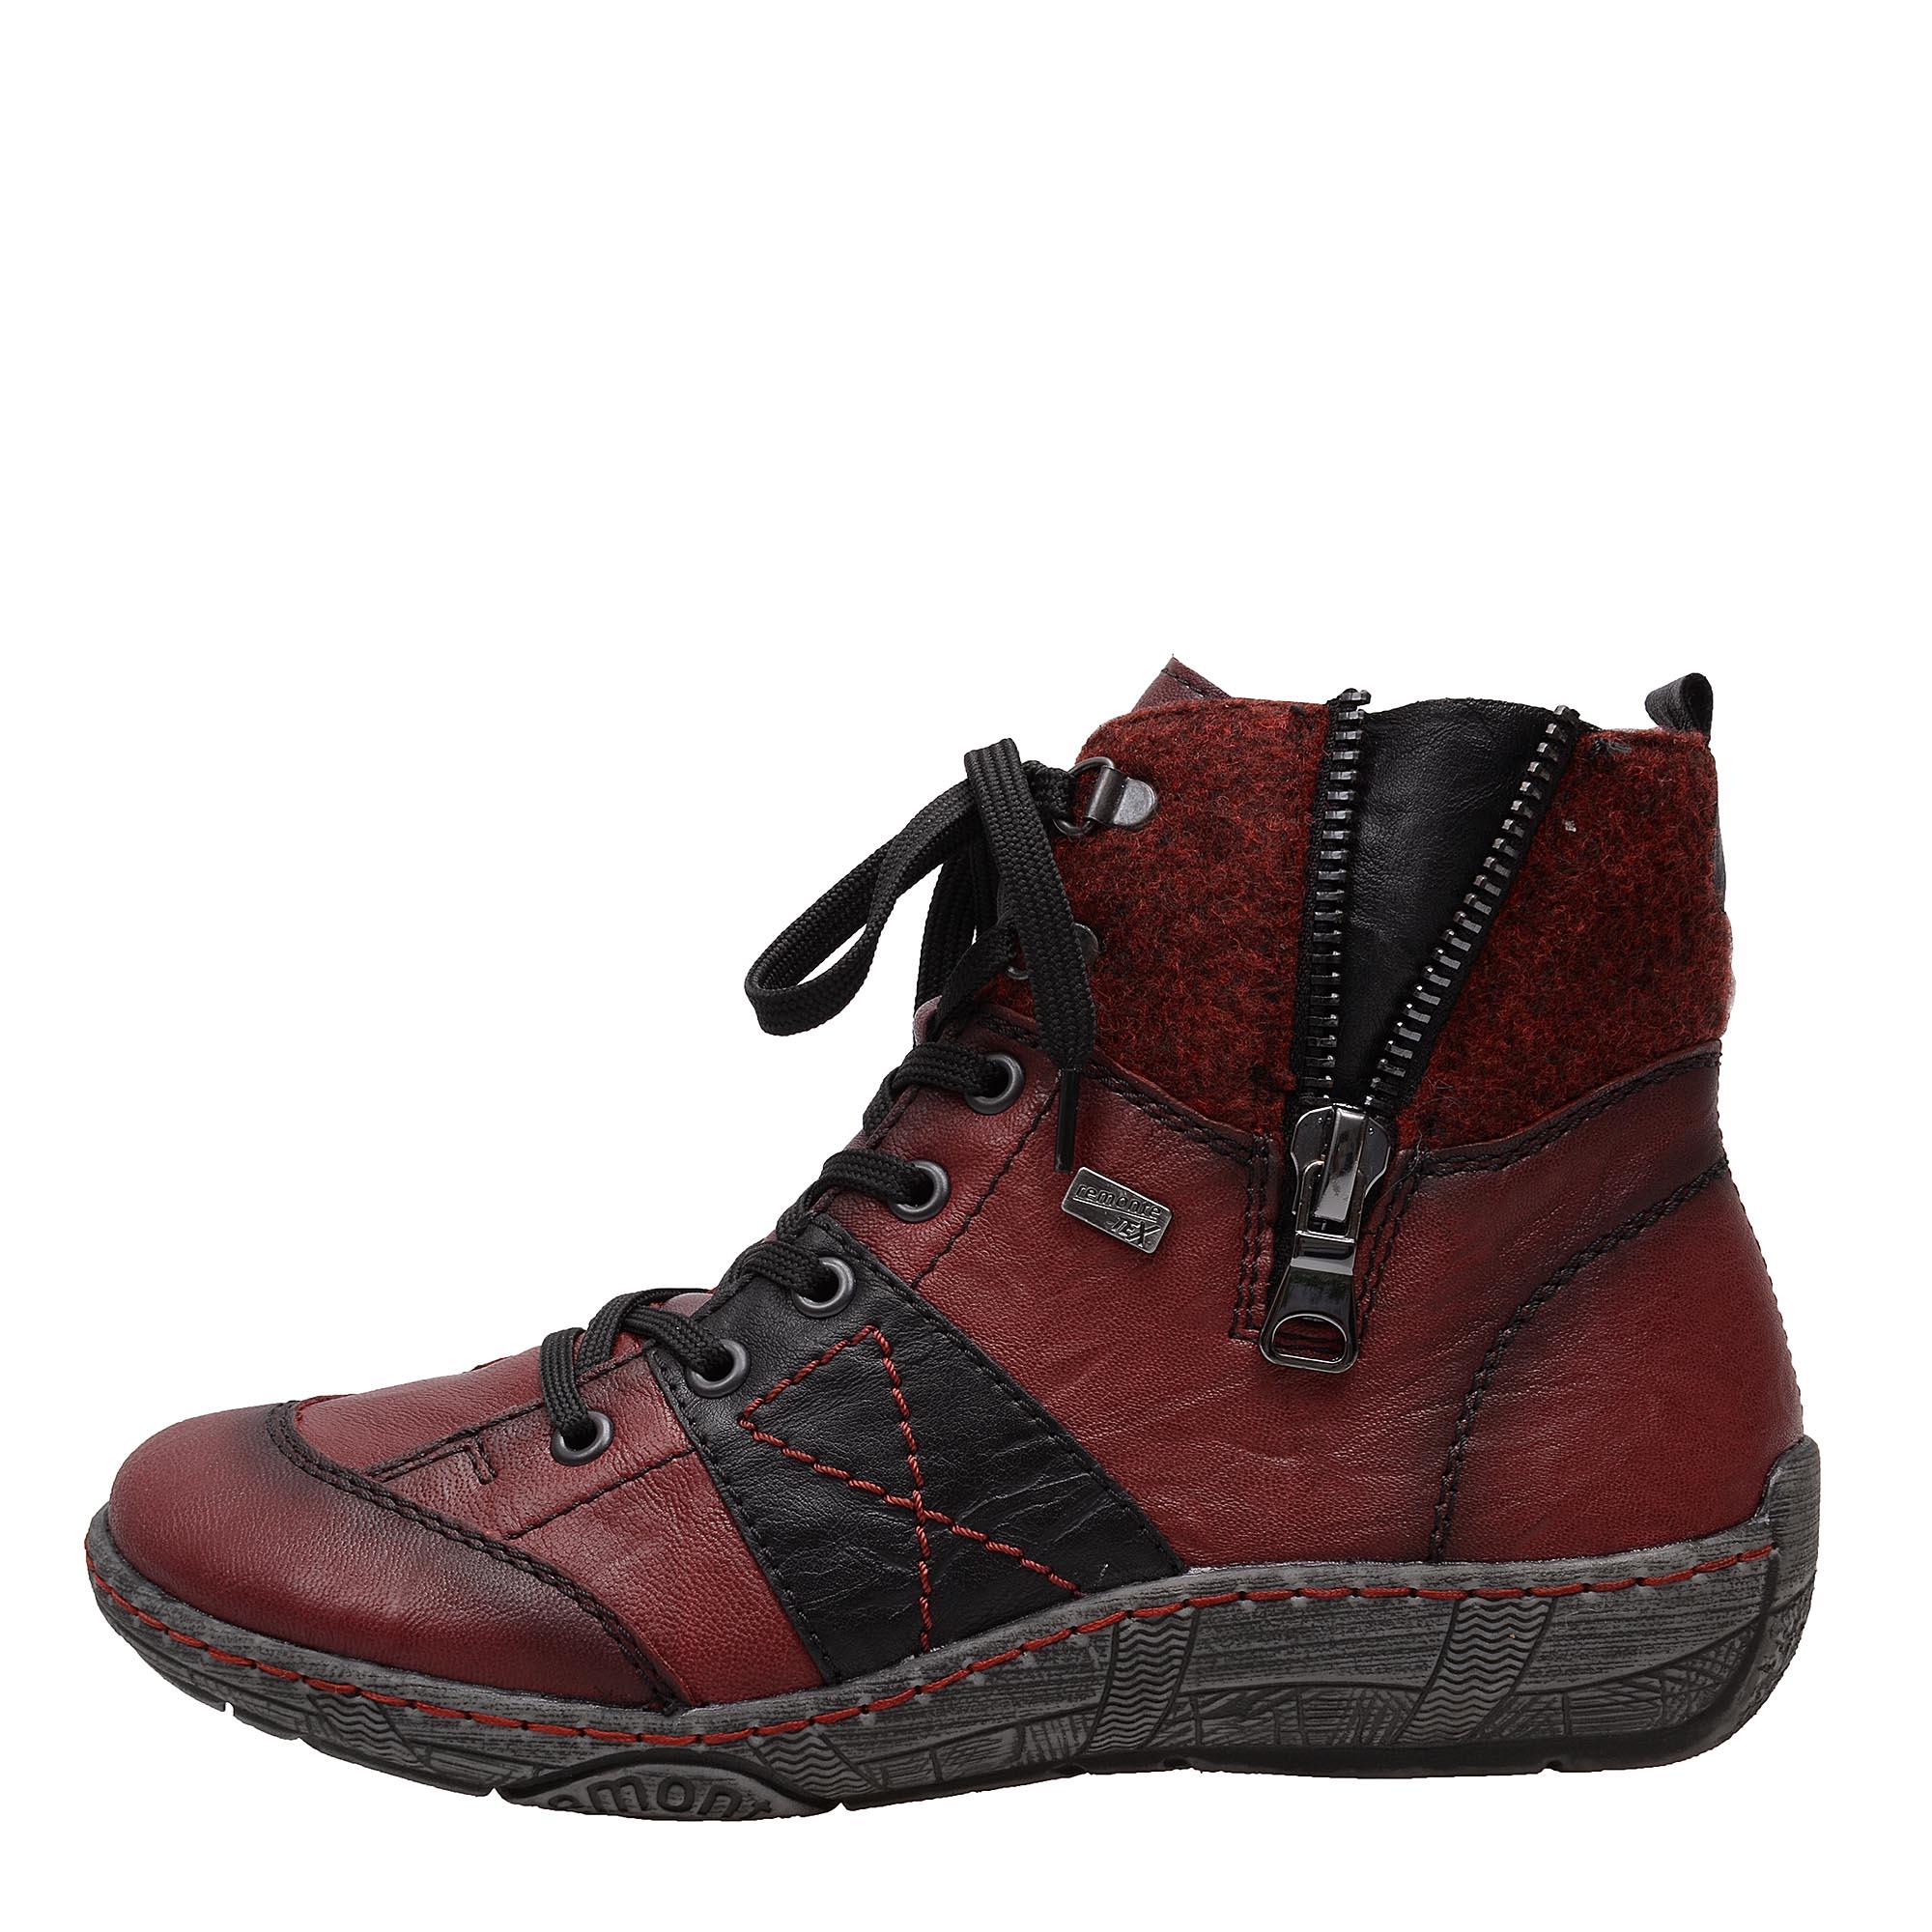 7da26f577506 detail Dámská obuv RIEKER - REMONTE br D3891 35 ROT KOMBI H